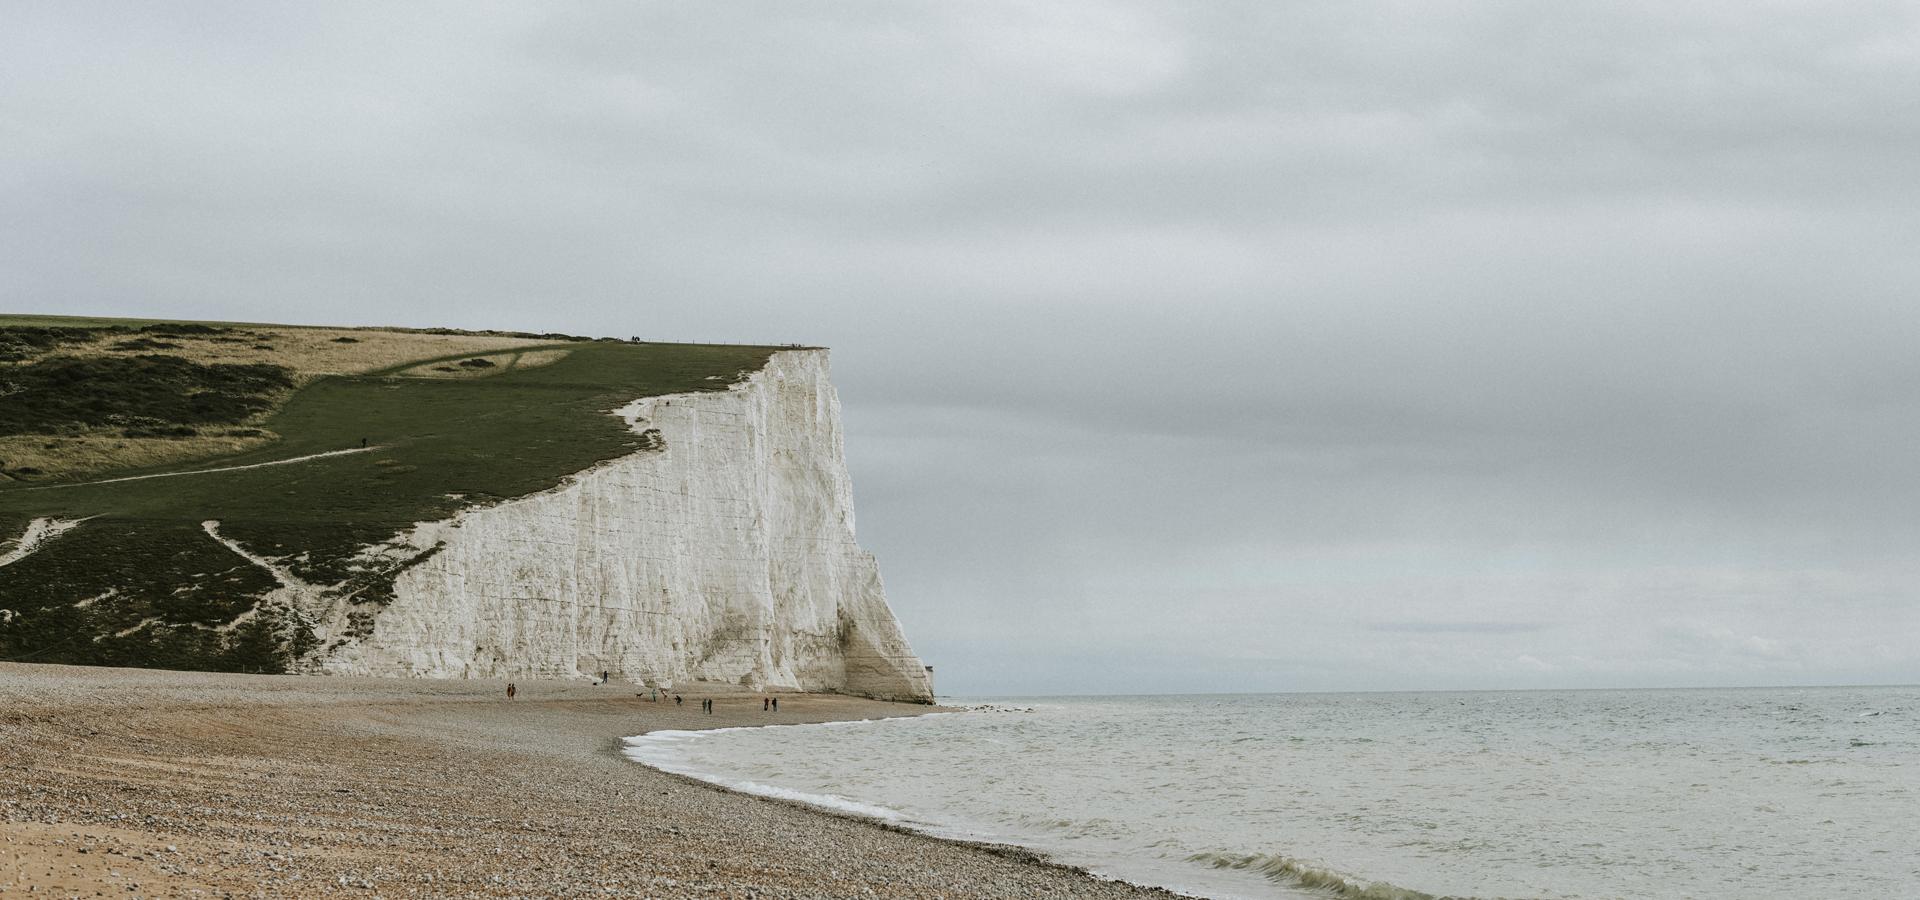 East Sussex - Seven Sisters Cliffs